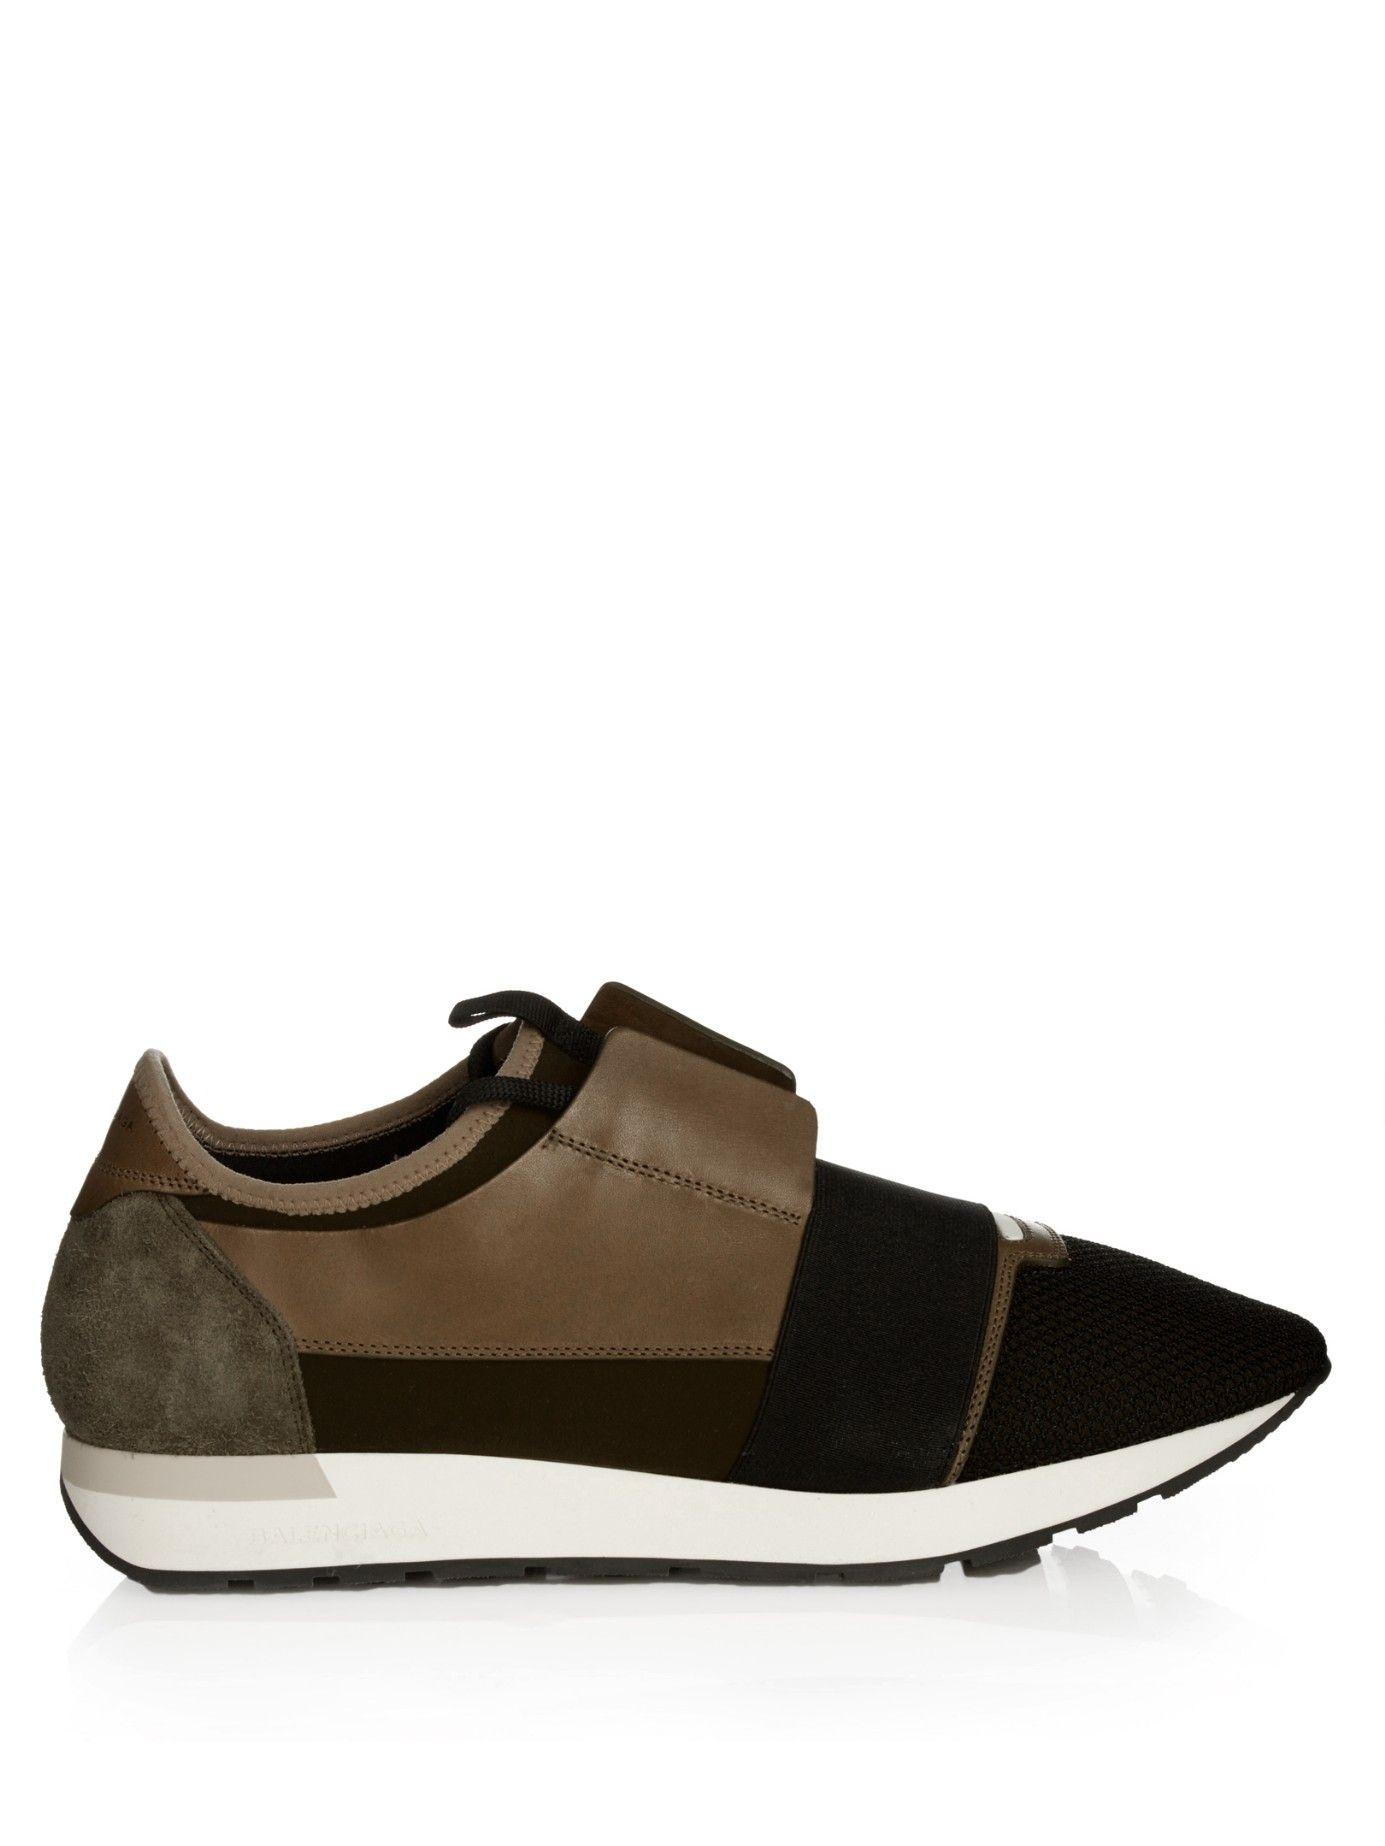 Balenciaga | Menswear | Shop Online at MATCHESFASHION.COM US. Balenciaga  RunnersGreaser StyleBalenciaga SneakersDesigner ShoesShoes ...